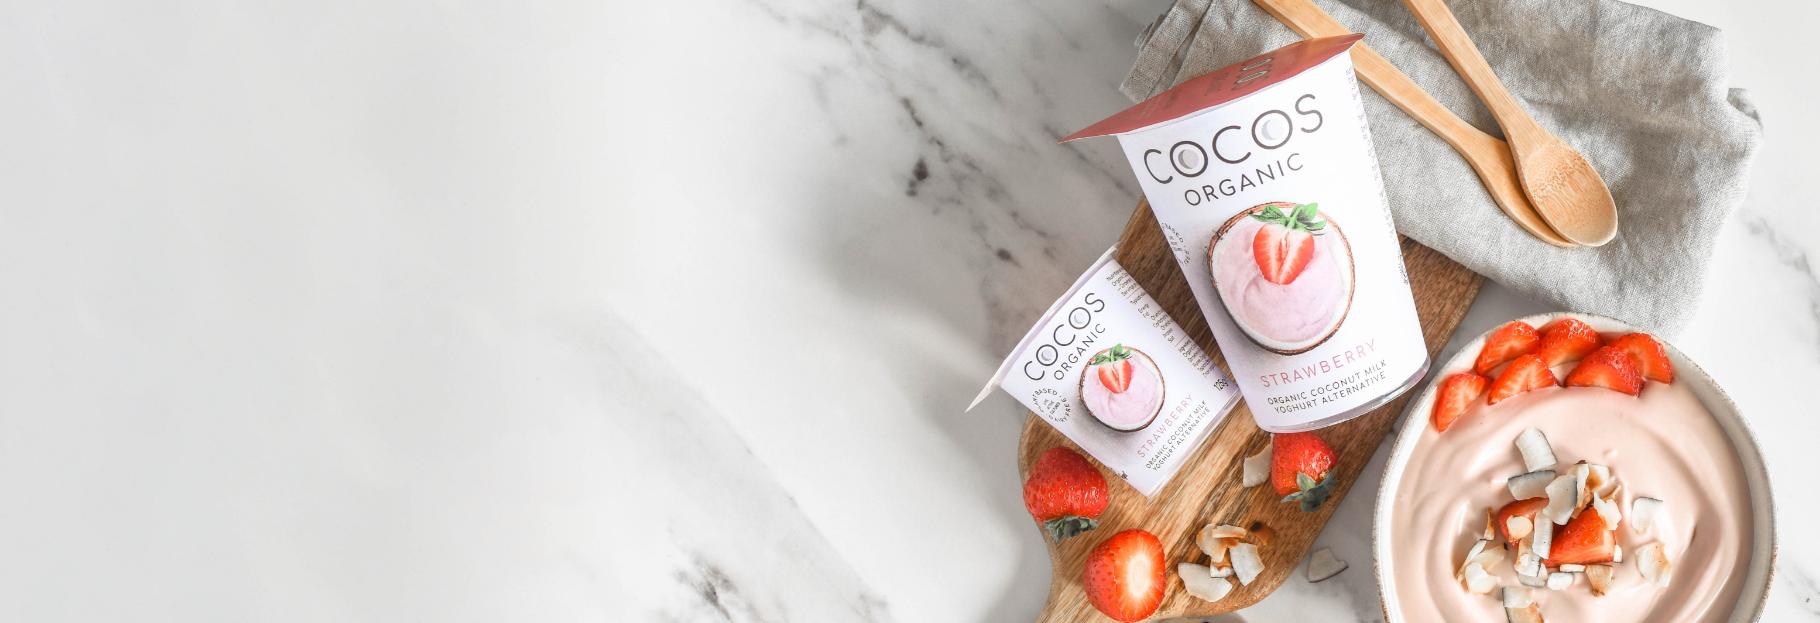 Cocos Organic